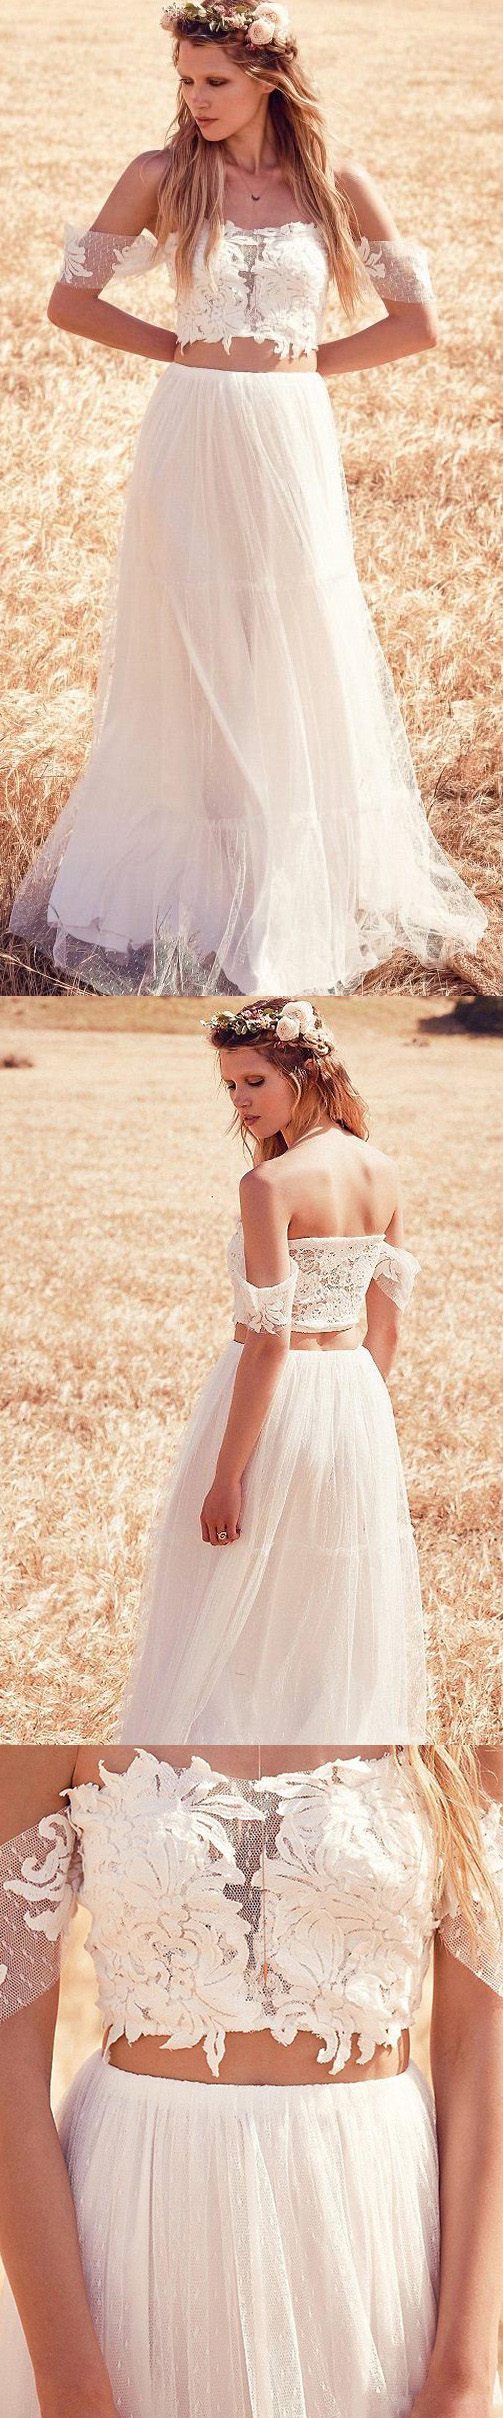 Lace ivory wedding dresses cute long offtheshoulder short sleeve